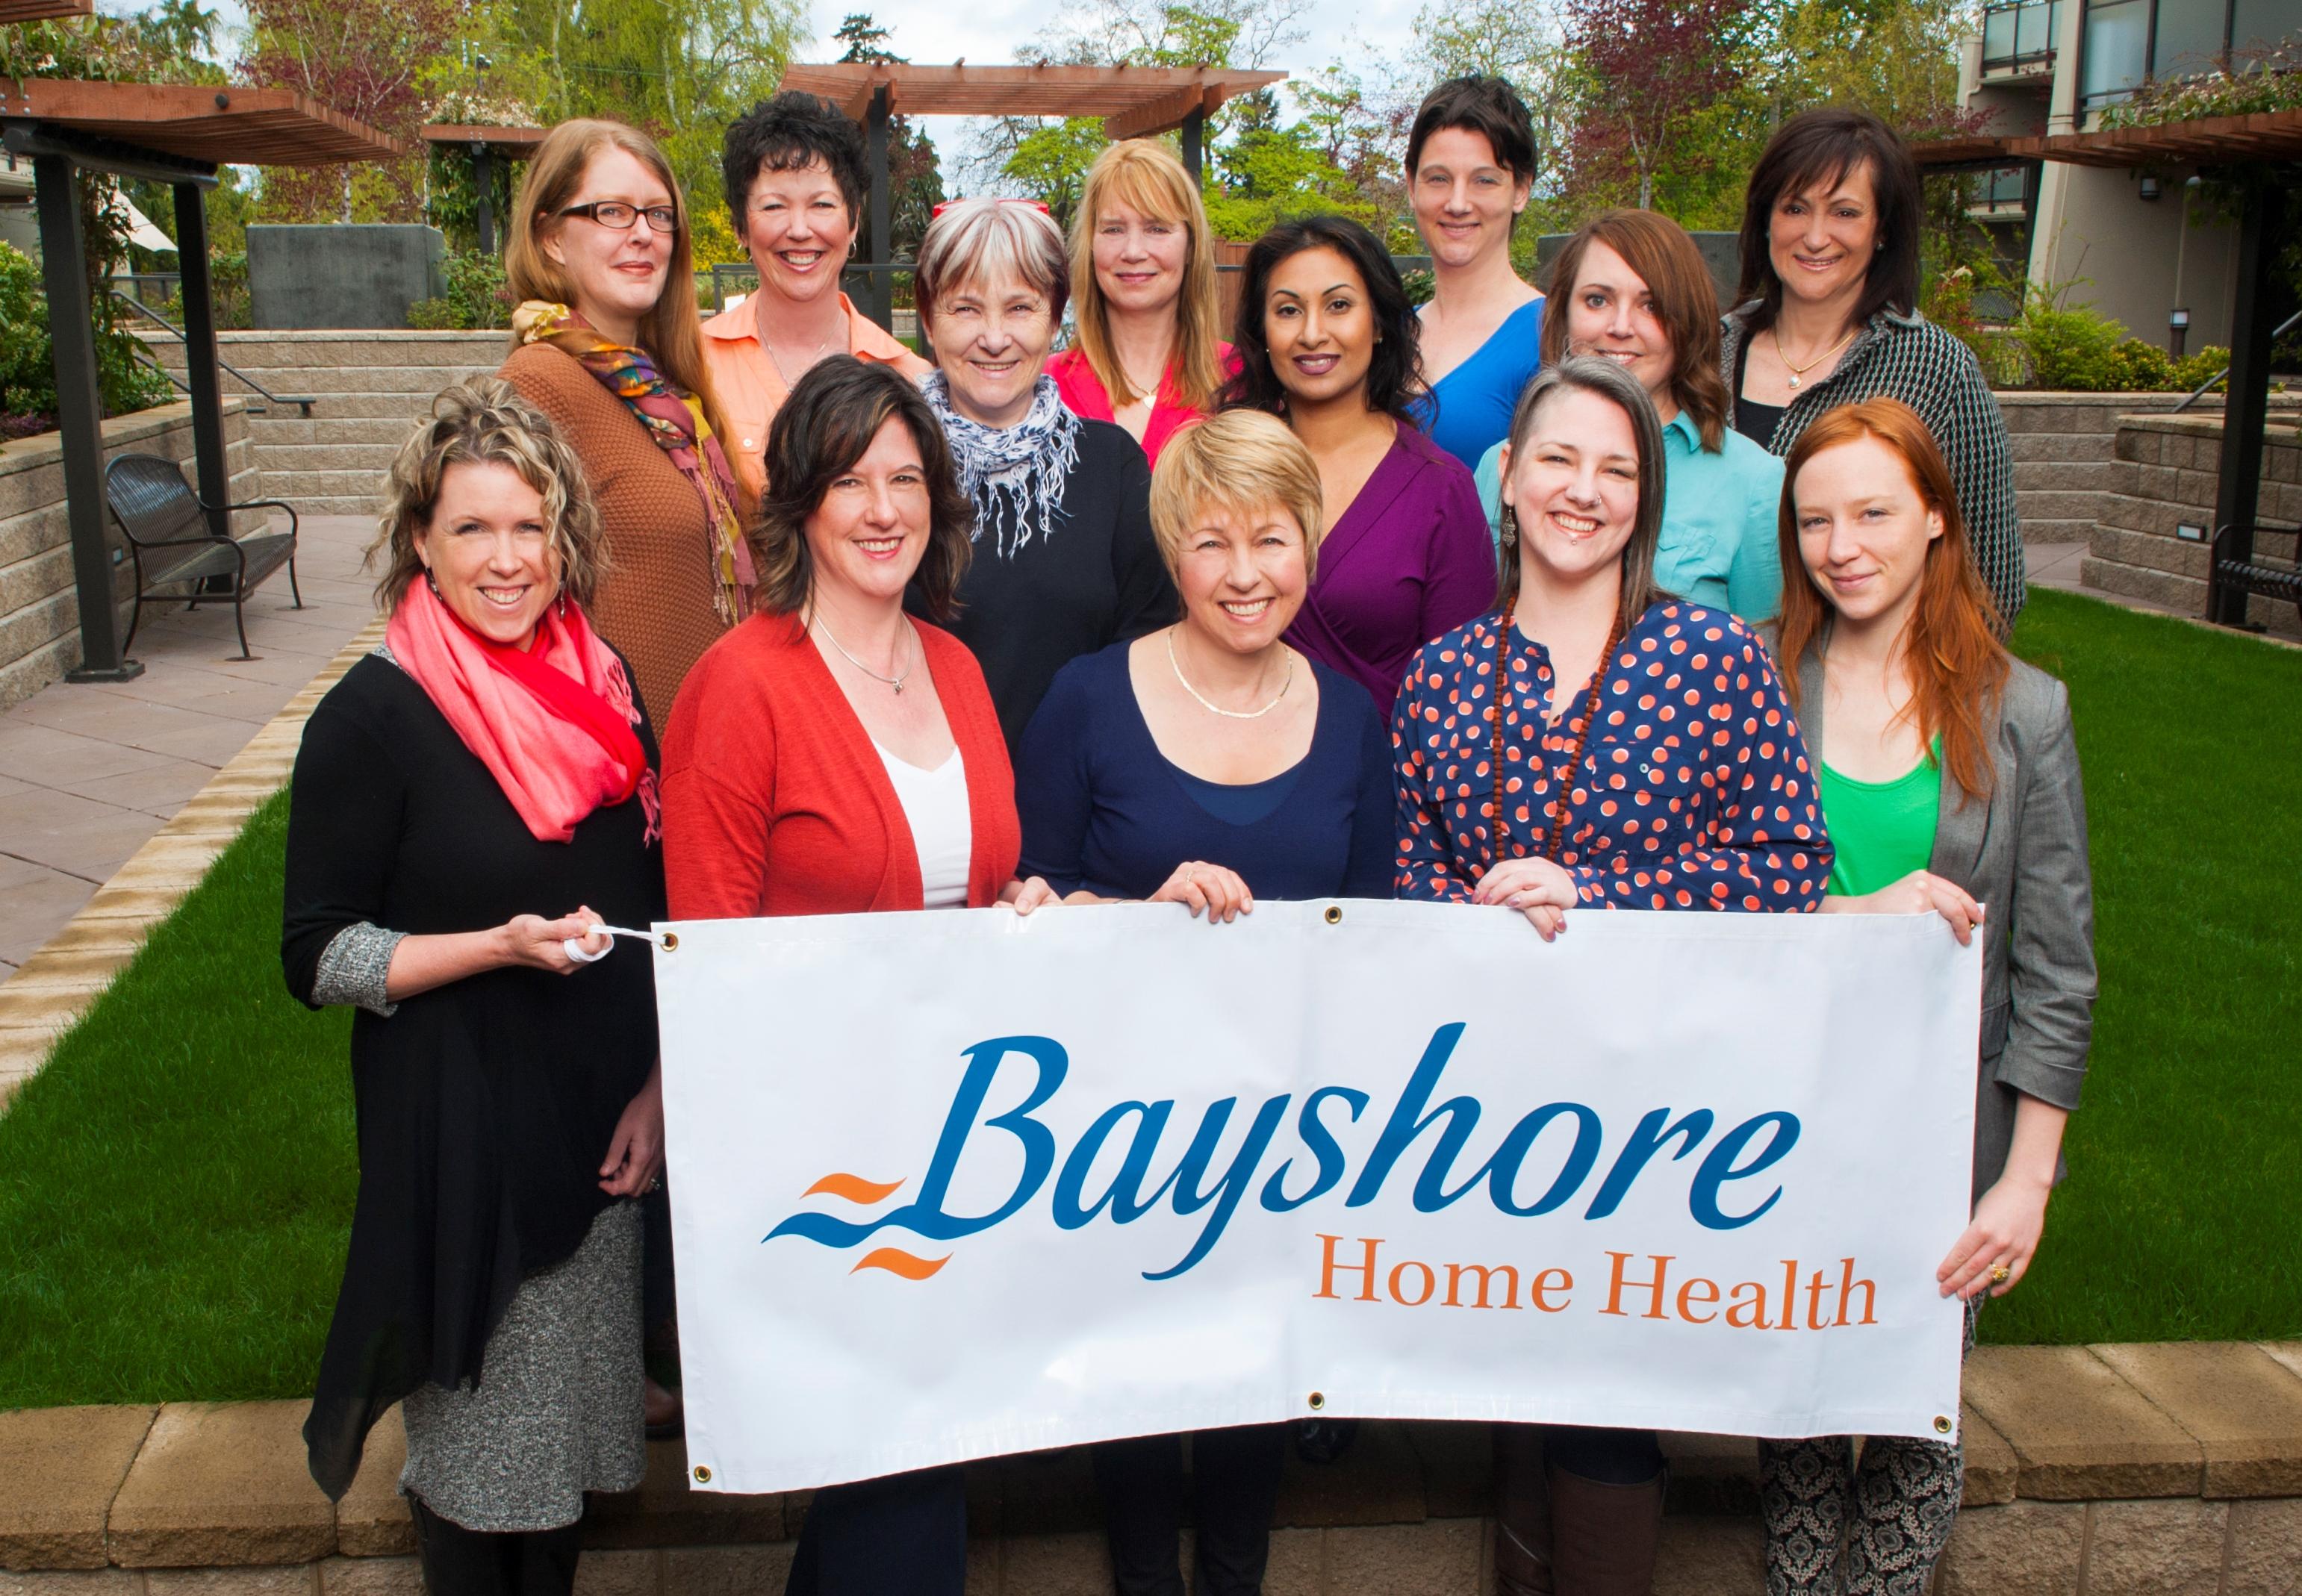 Bayshore Home Health Sidney team